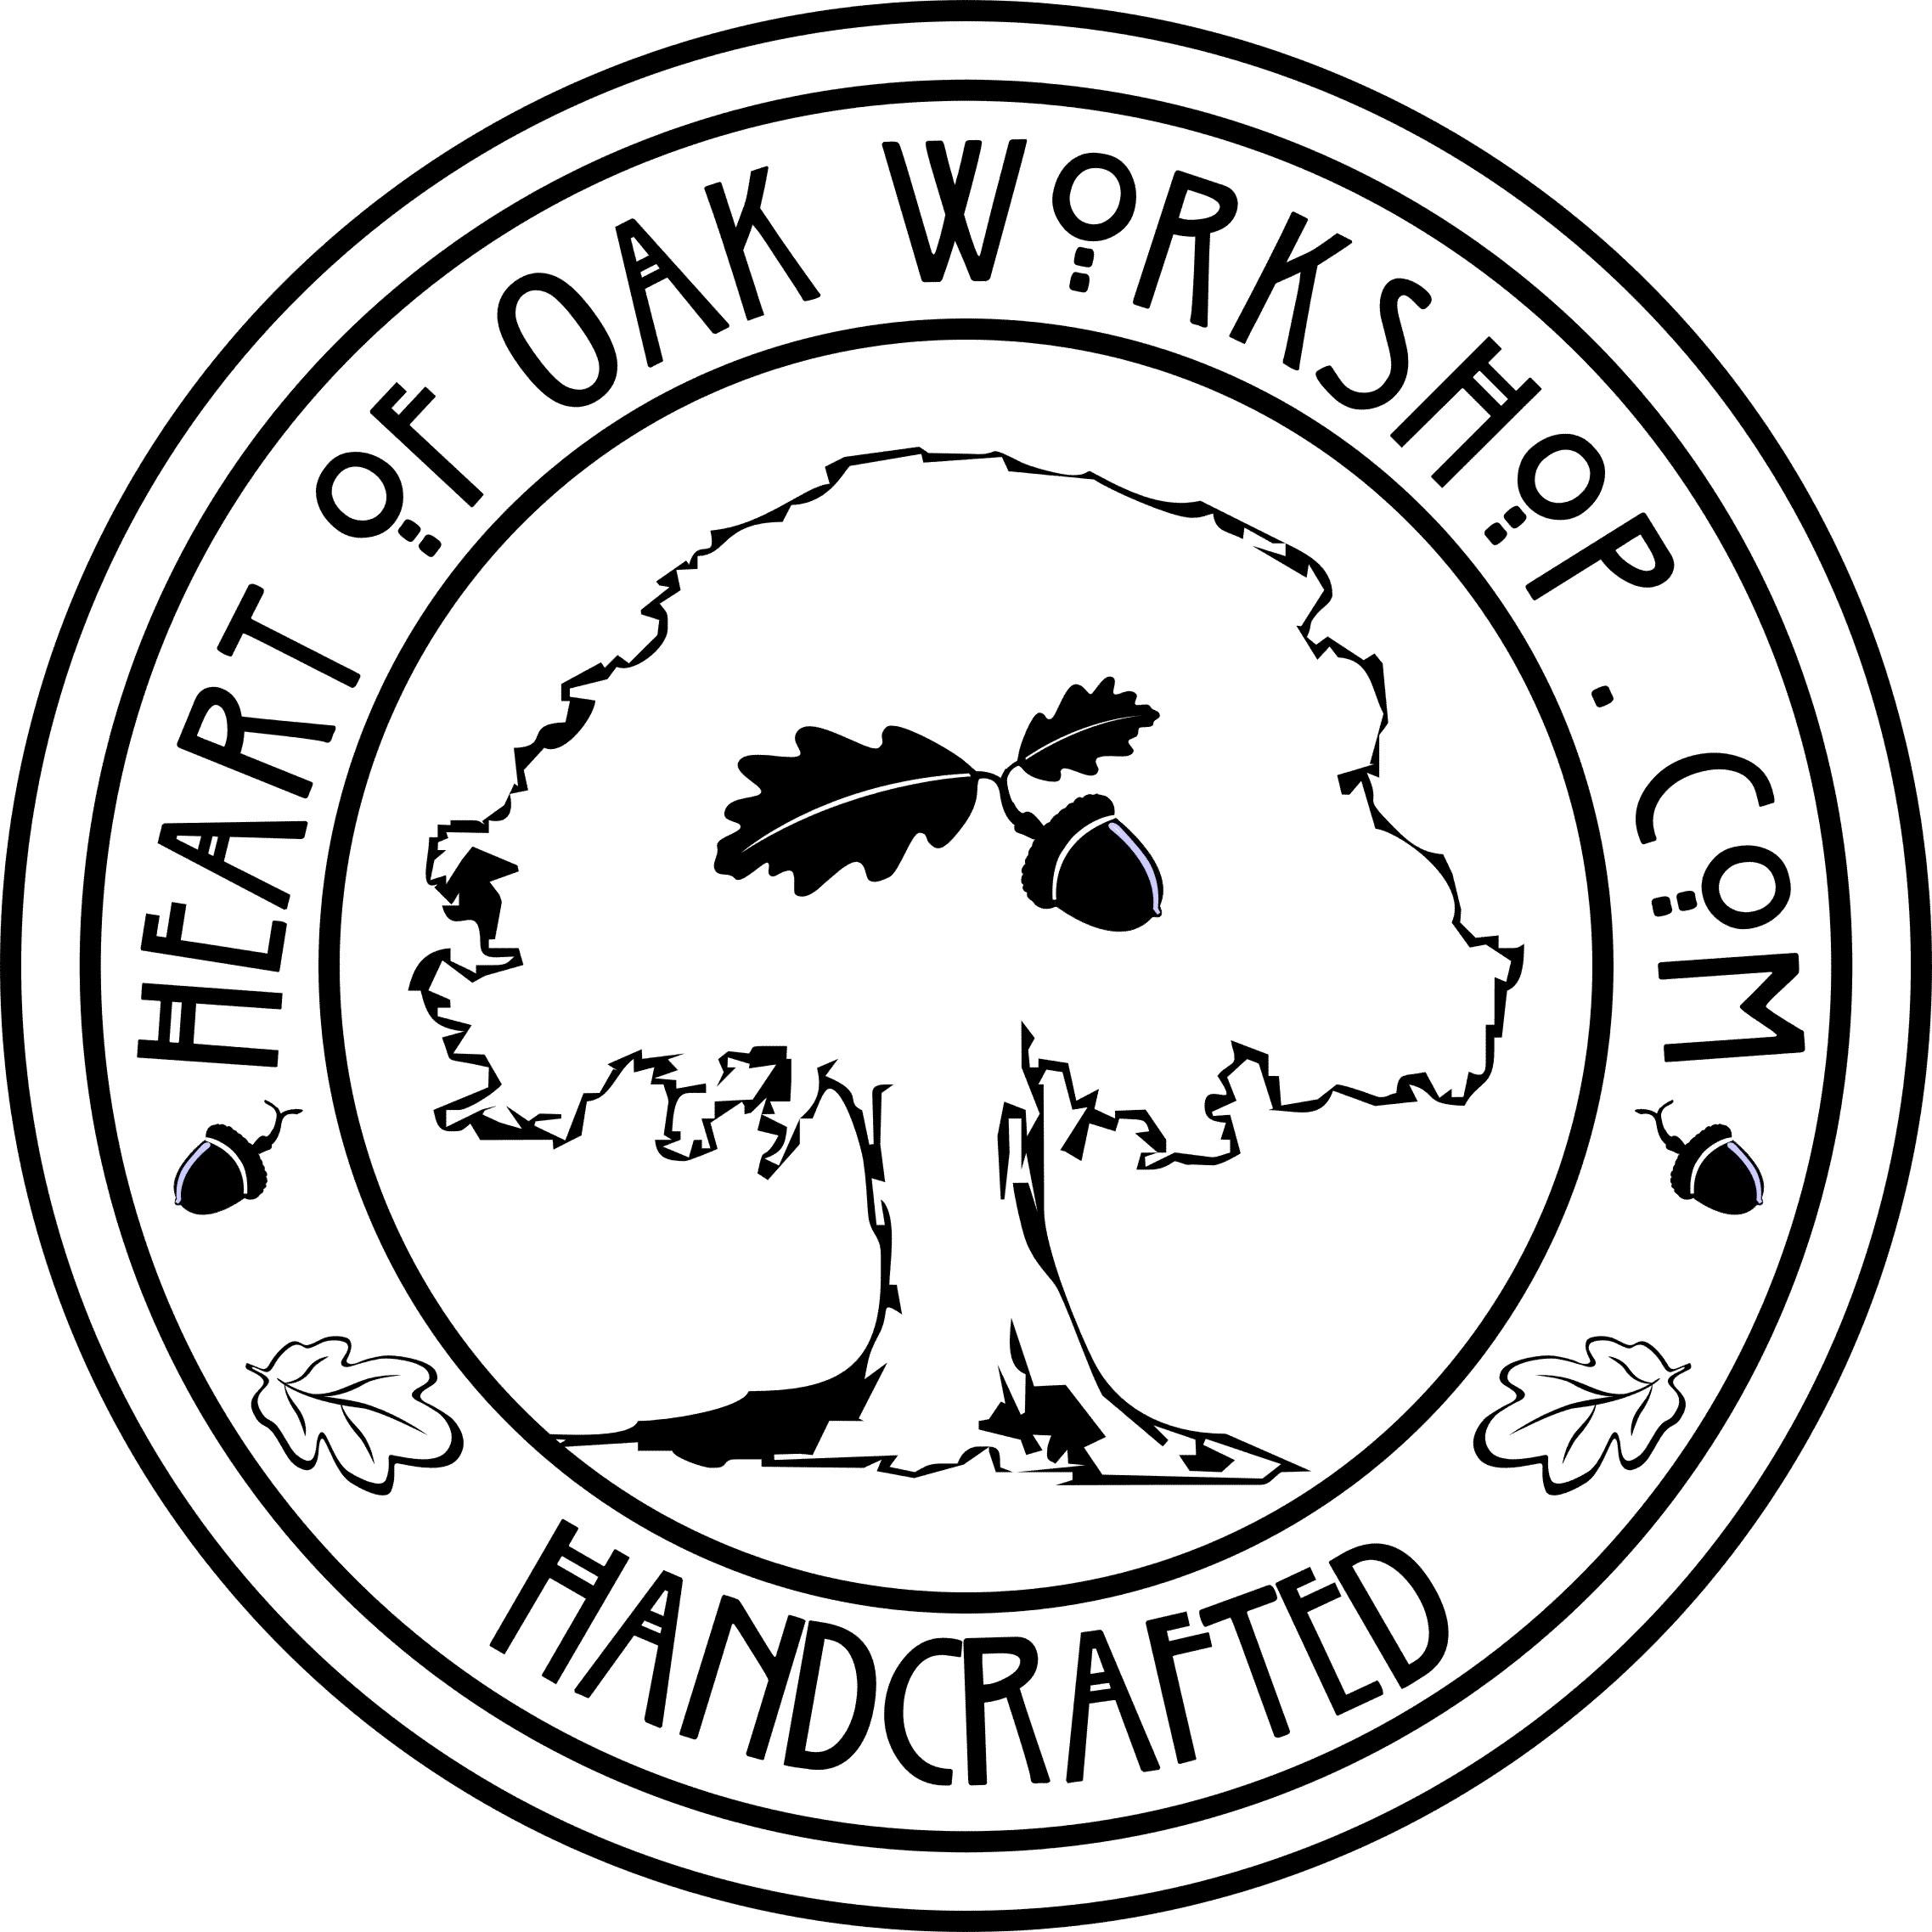 Heart of Oak Workshop, Authentic Craftsman & Mission style